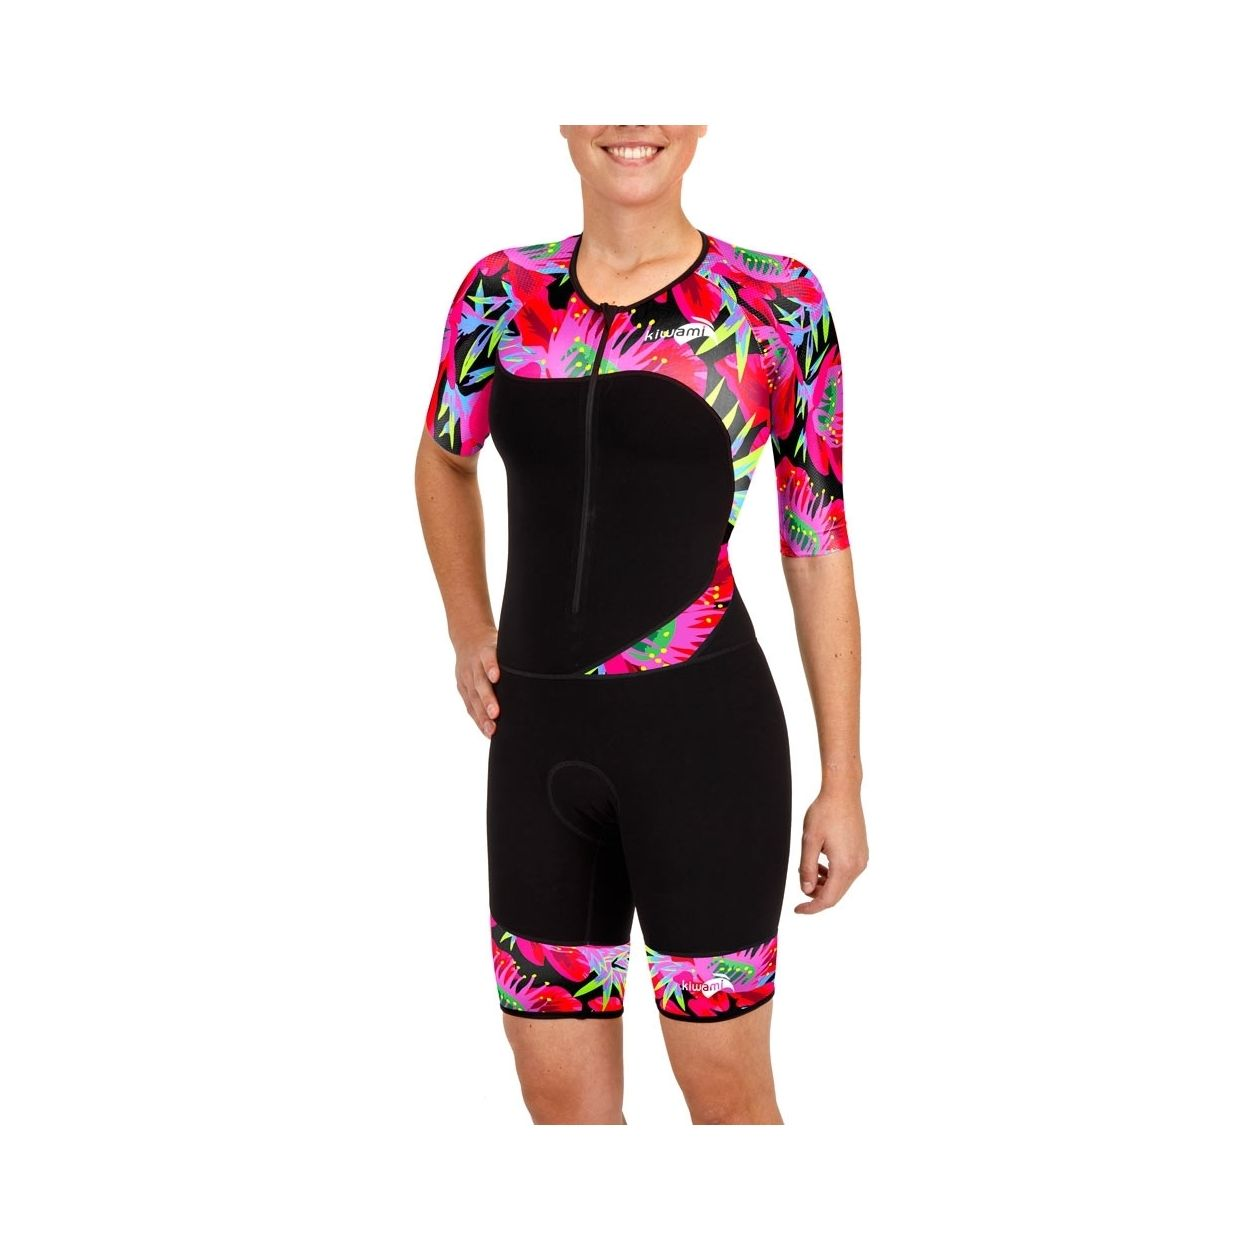 f5edcb7b442688 TRIFONCTION TOKYO AERO   KIWAMI - Women's triathlon gear - #swimbikerun    Triathlon gear, Triathlon clothing, Bike run